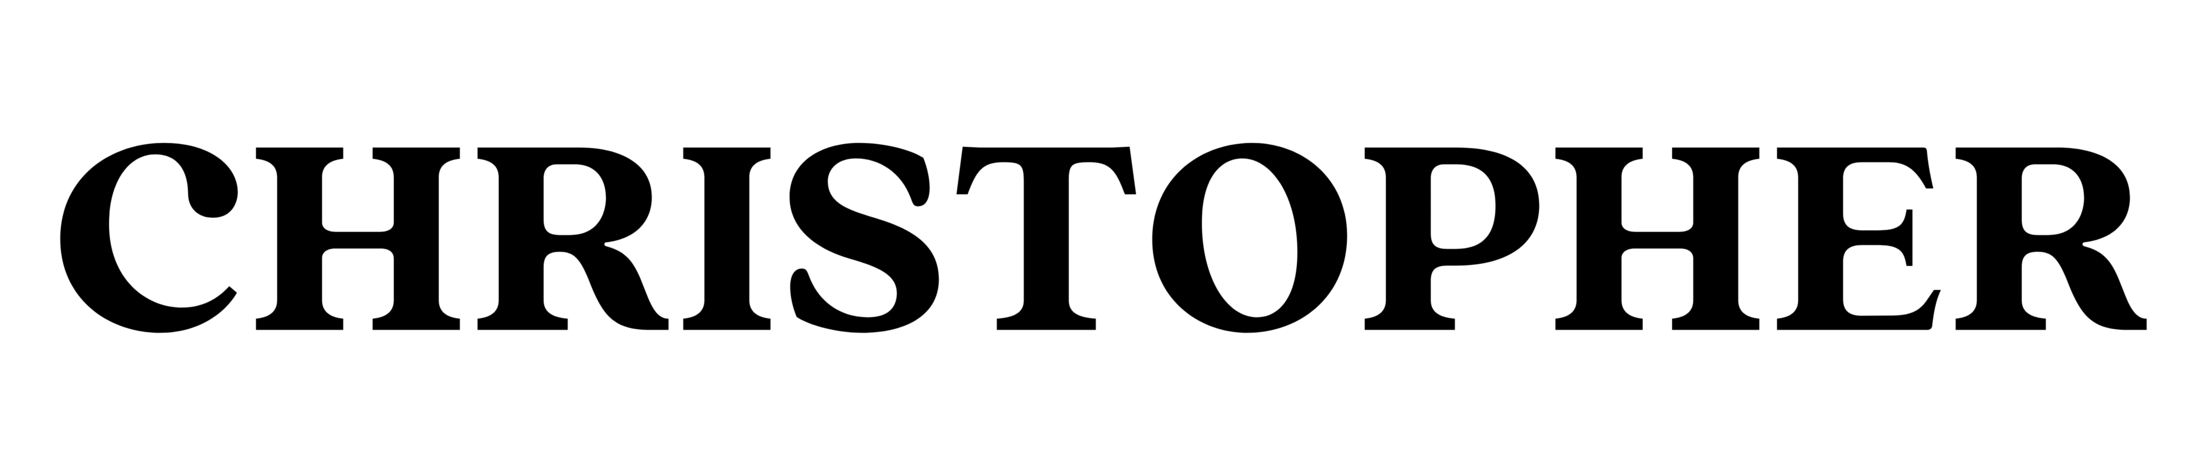 Christopher Chin logo